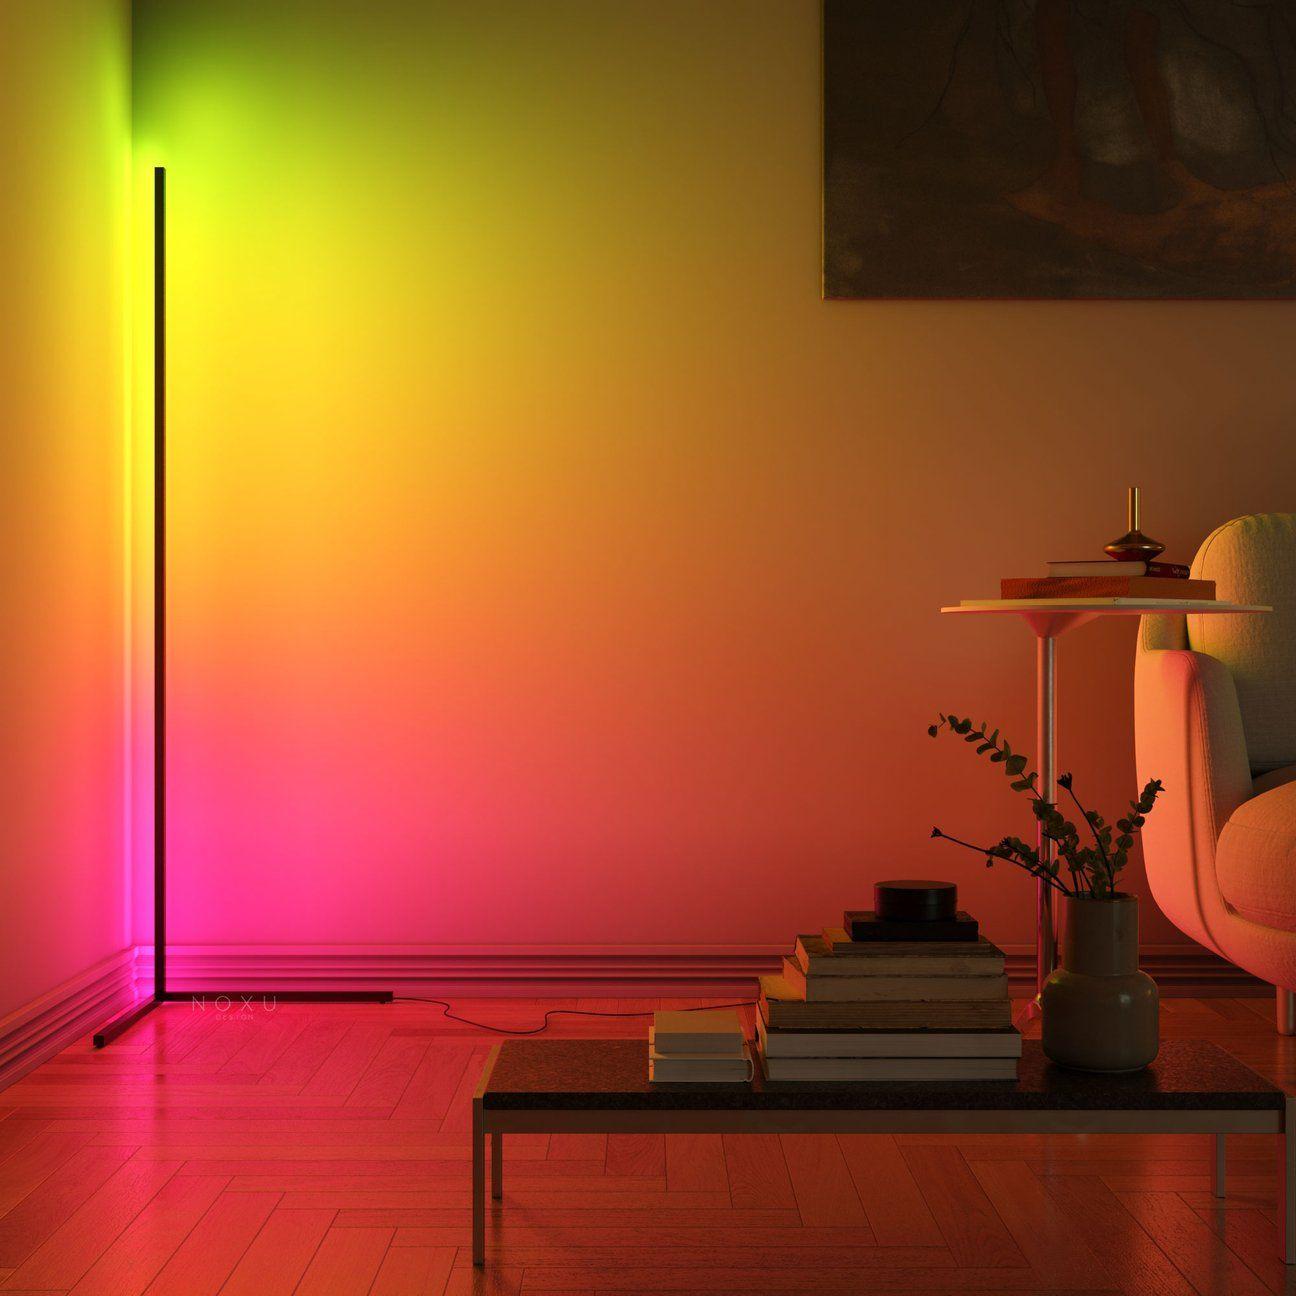 Kōna Floor Lamp Noxu Design In 2020 Floor Lamp Comfortable Bedroom Decor Japanese Minimalism